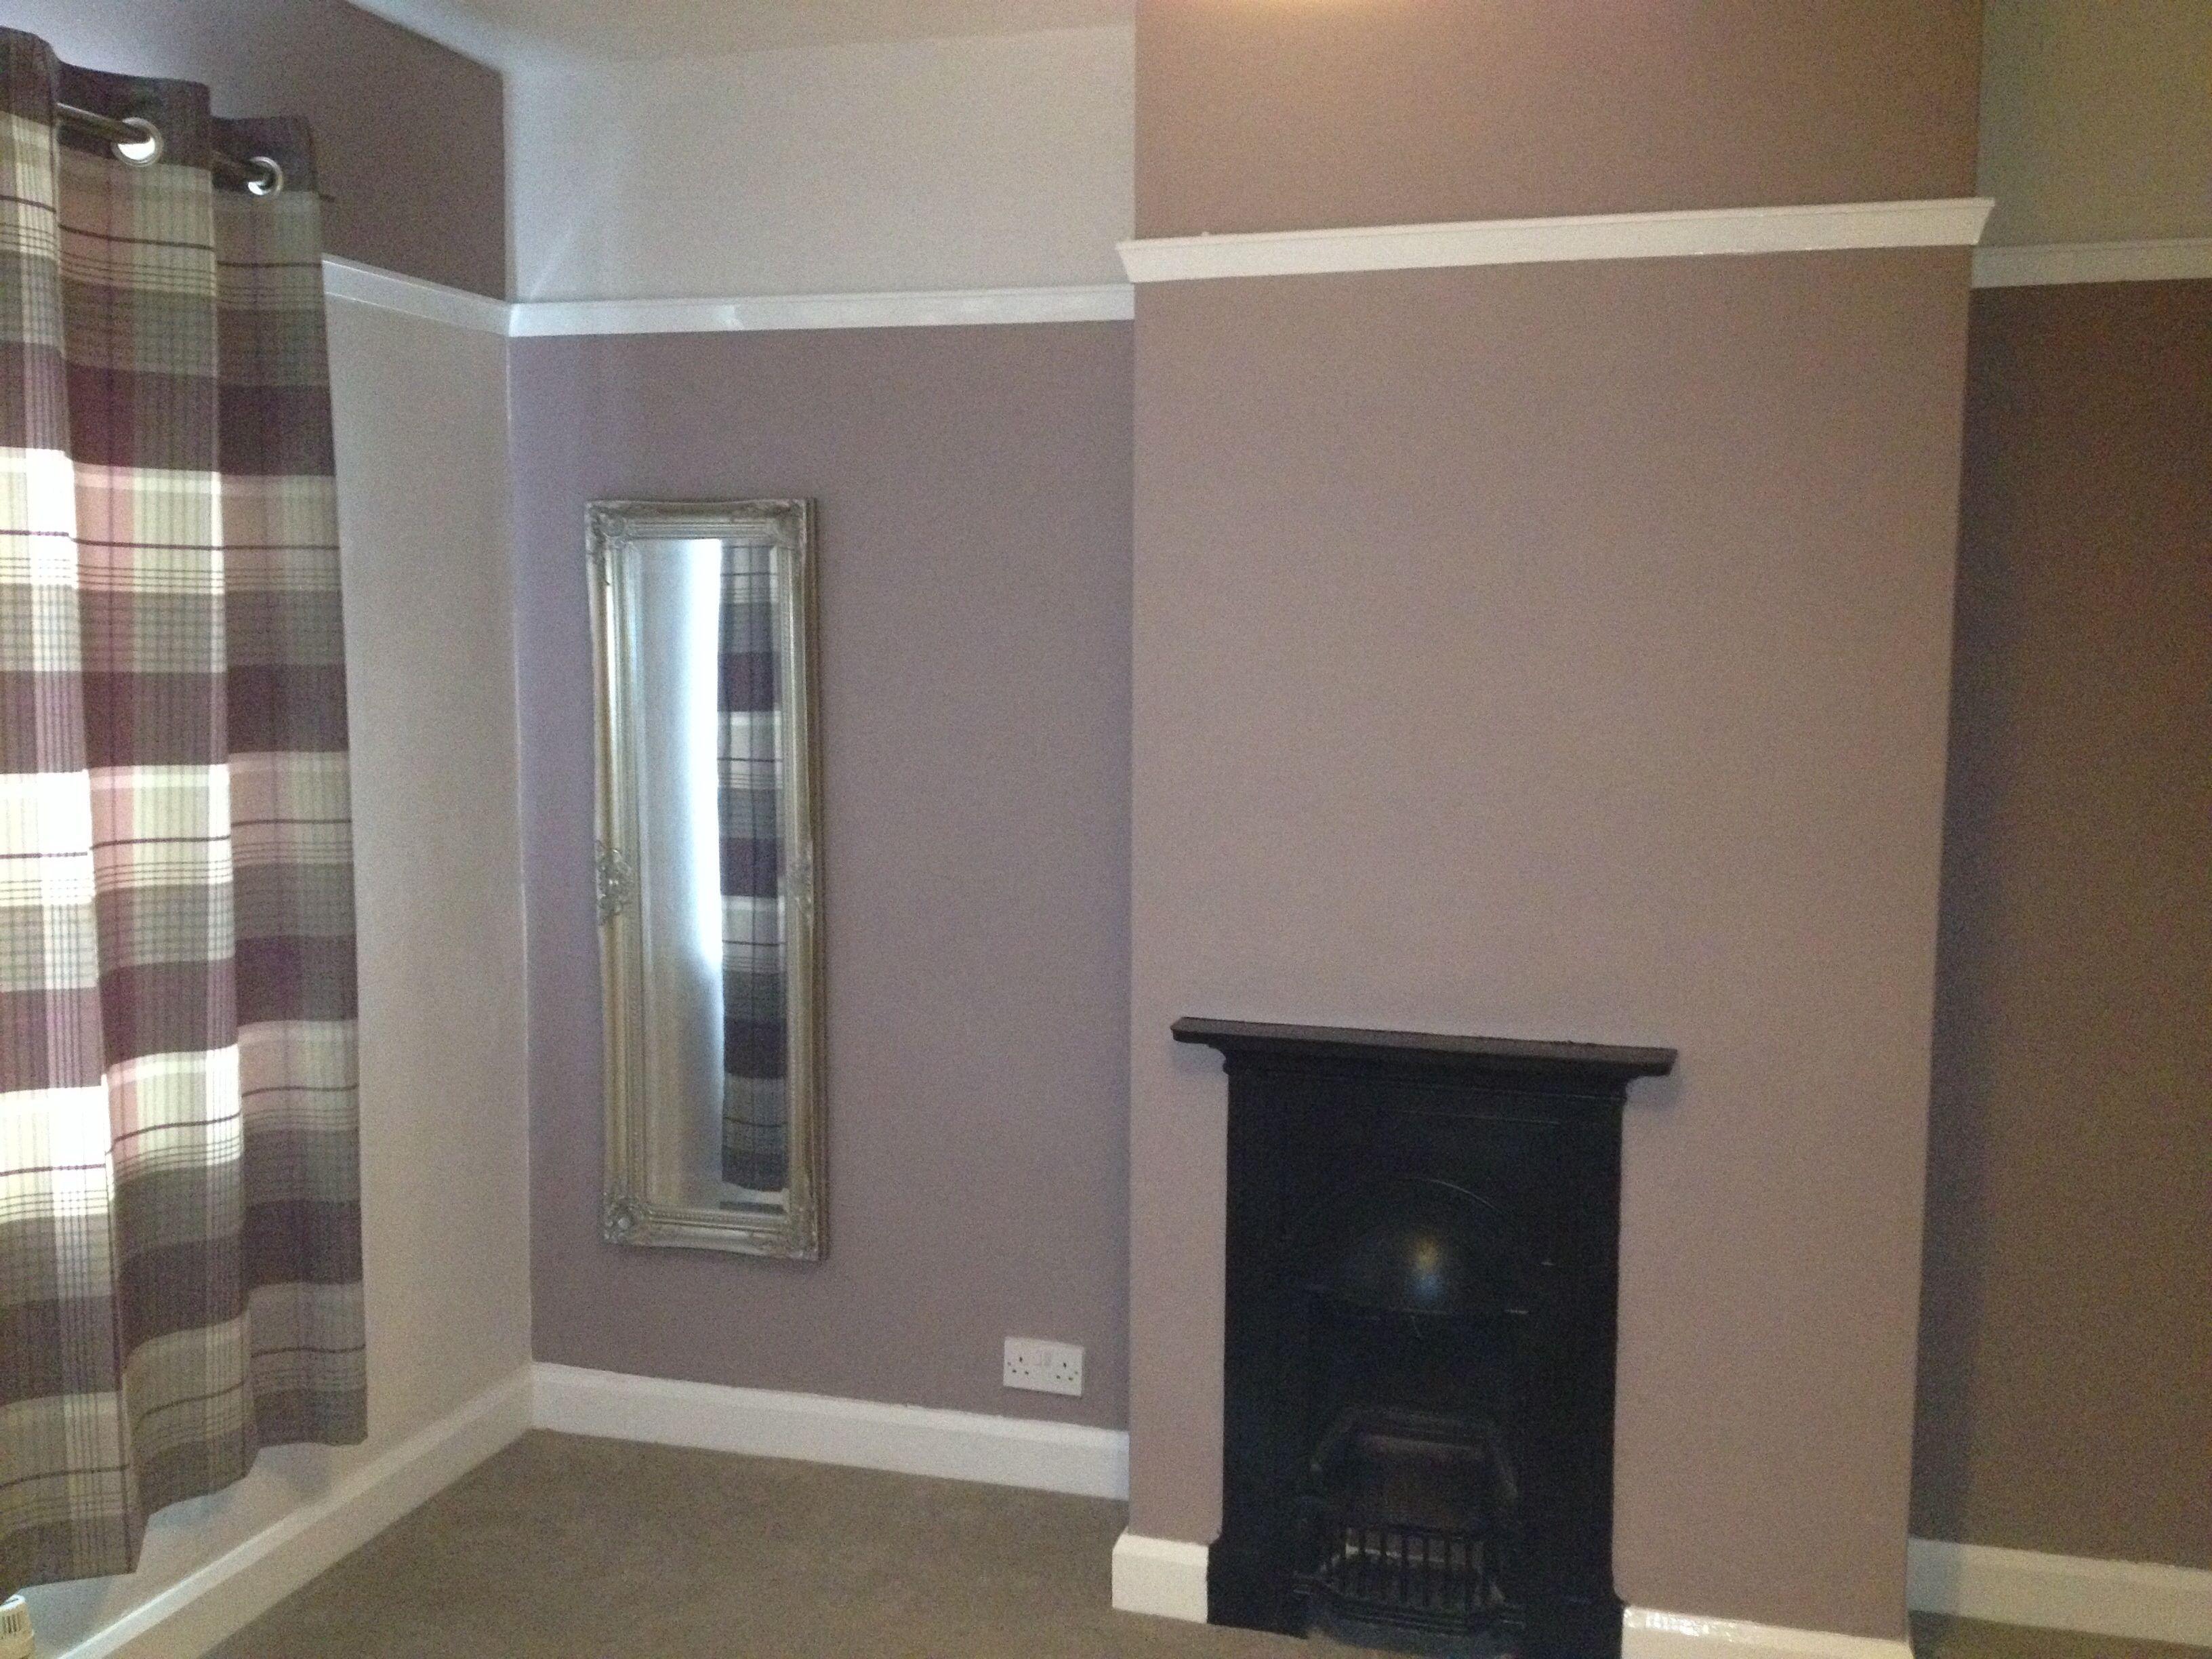 dusted damson nutmeg white new bedroom purple colors. Black Bedroom Furniture Sets. Home Design Ideas